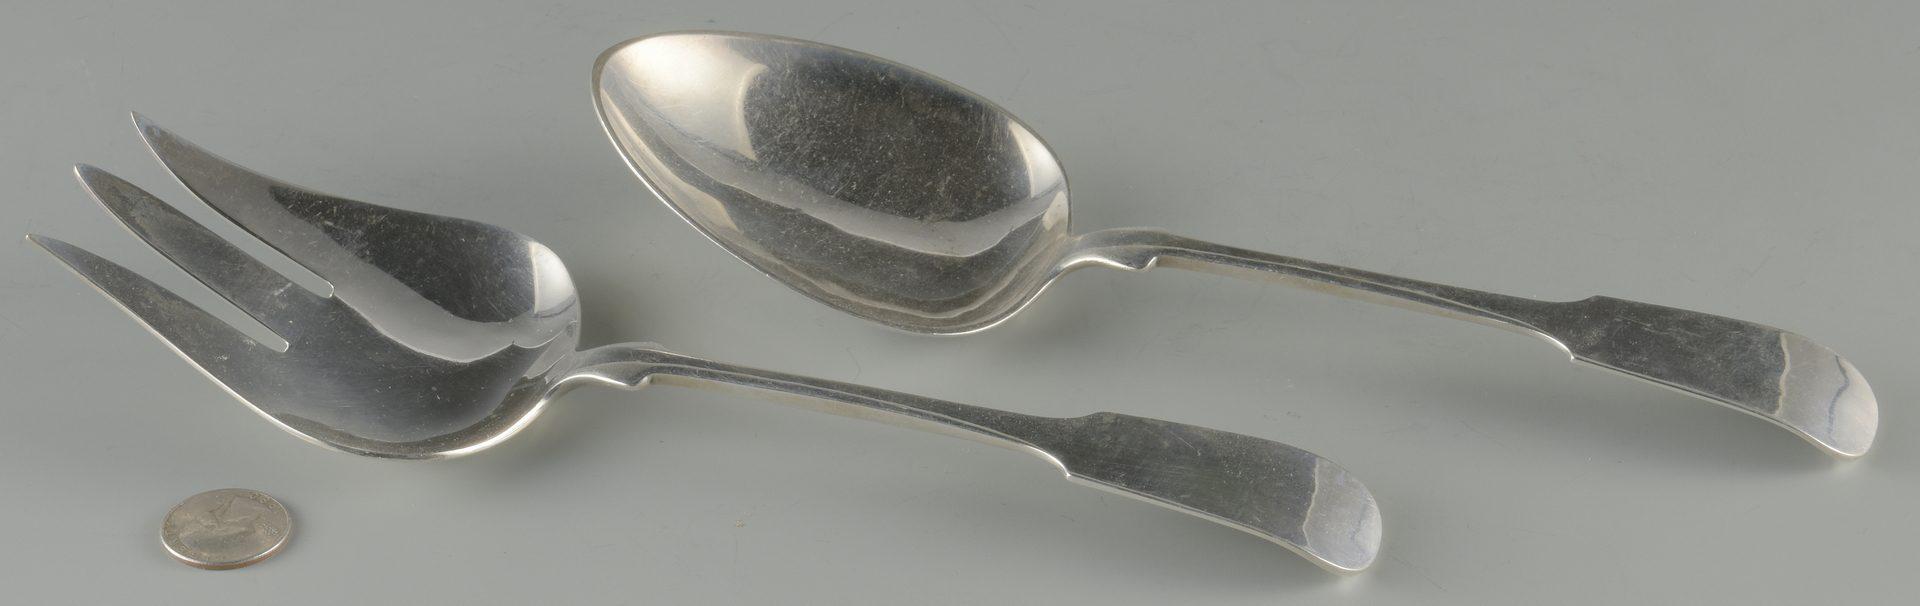 Lot 749: 4 Pcs. Sterling Silver, incl. Jenson